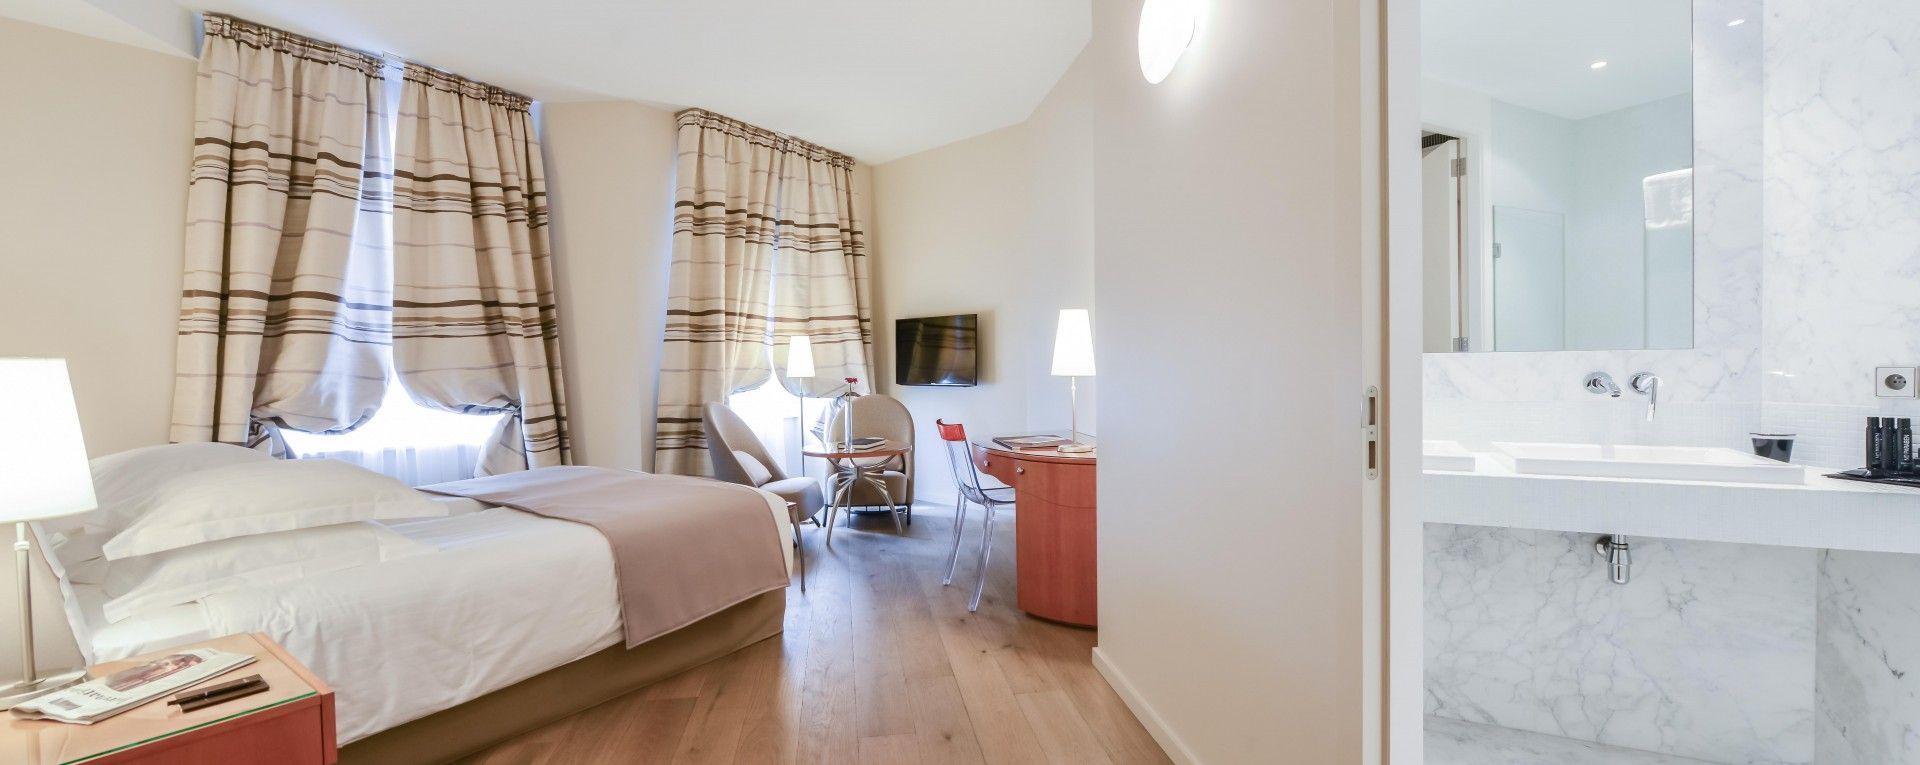 Regent petite france spa hotel strasbourg france - Le petit salon madrid ...